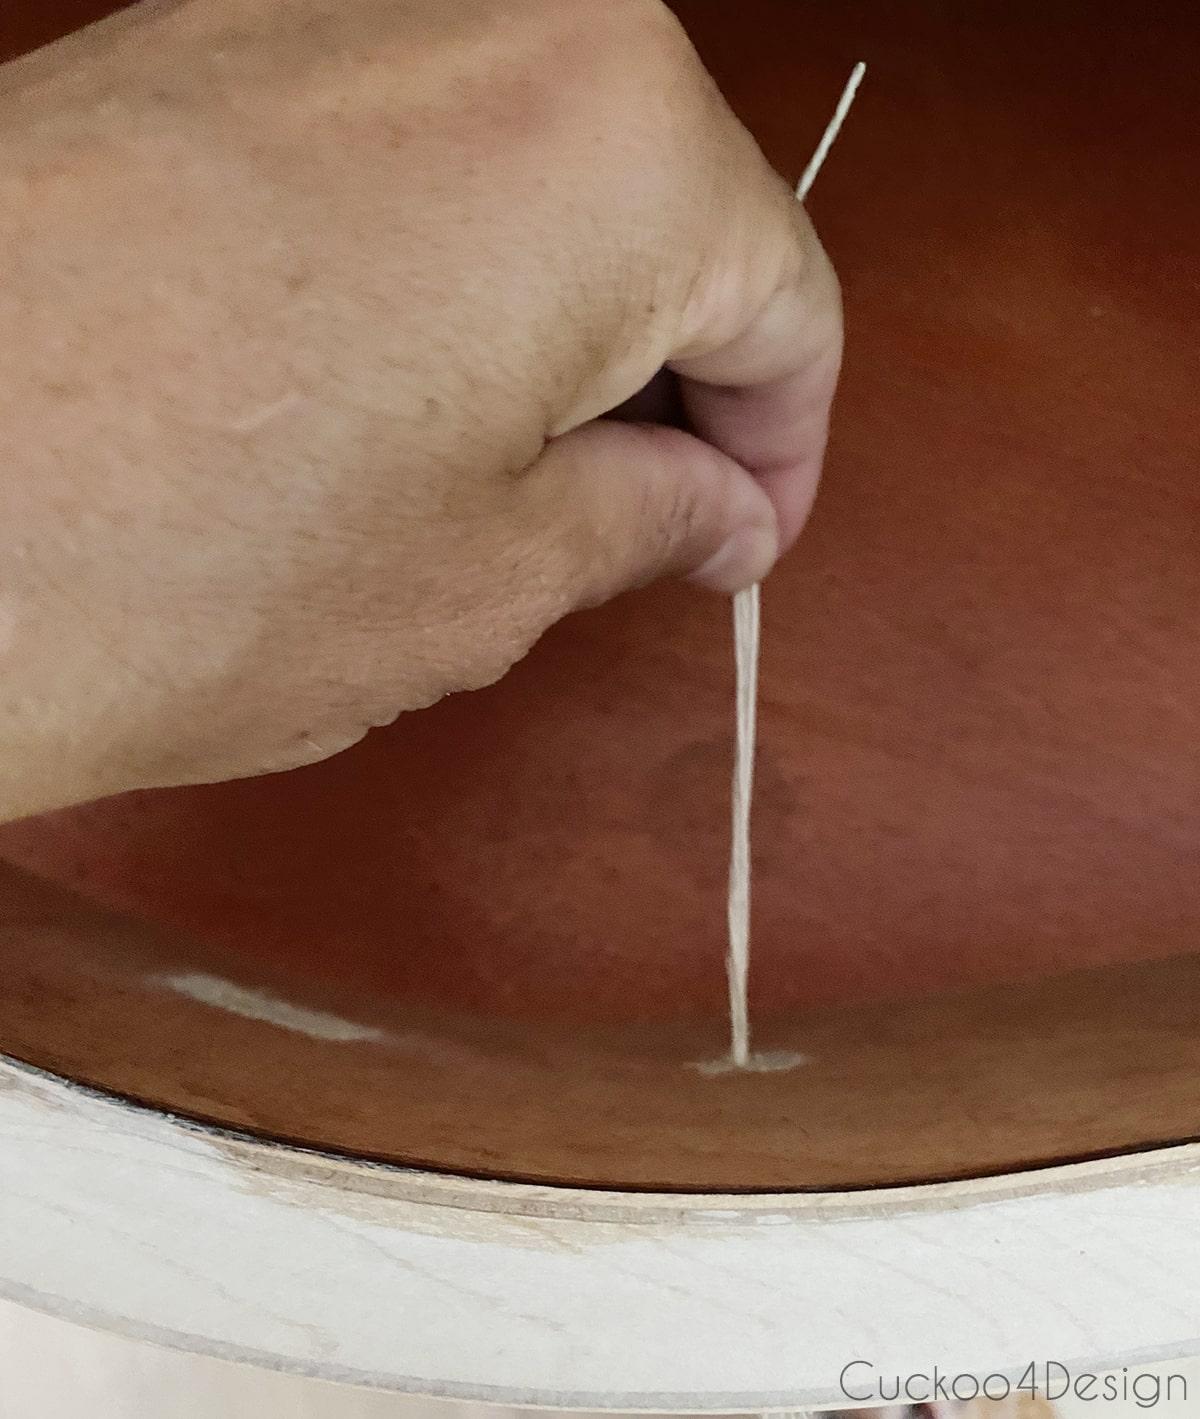 threading hemp cord through dresser hardware holes